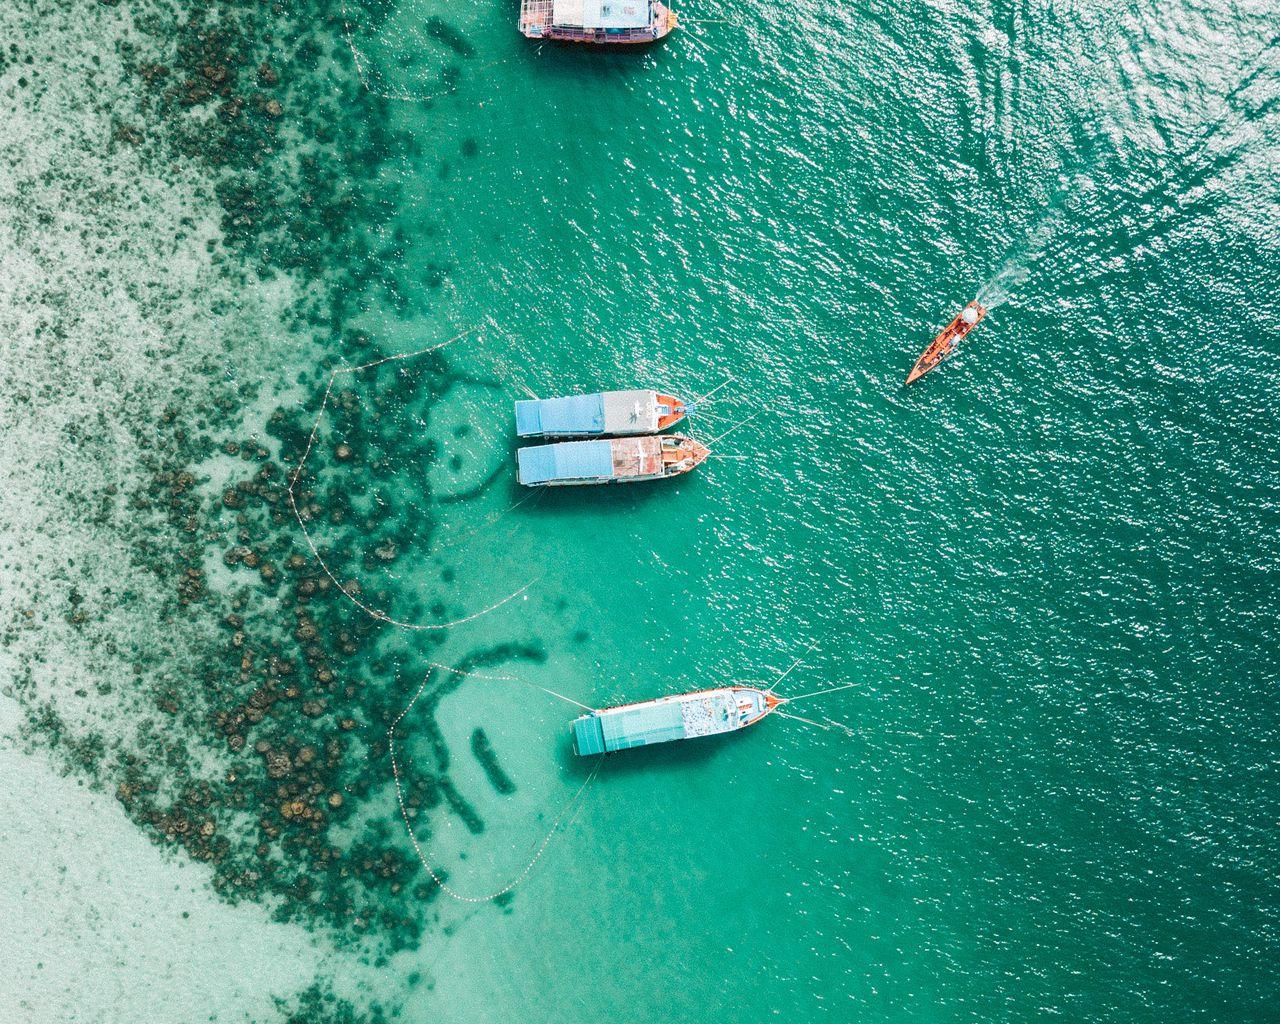 1280x1024 Wallpaper shore, boats, sandbar, ocean, moored, aerial view